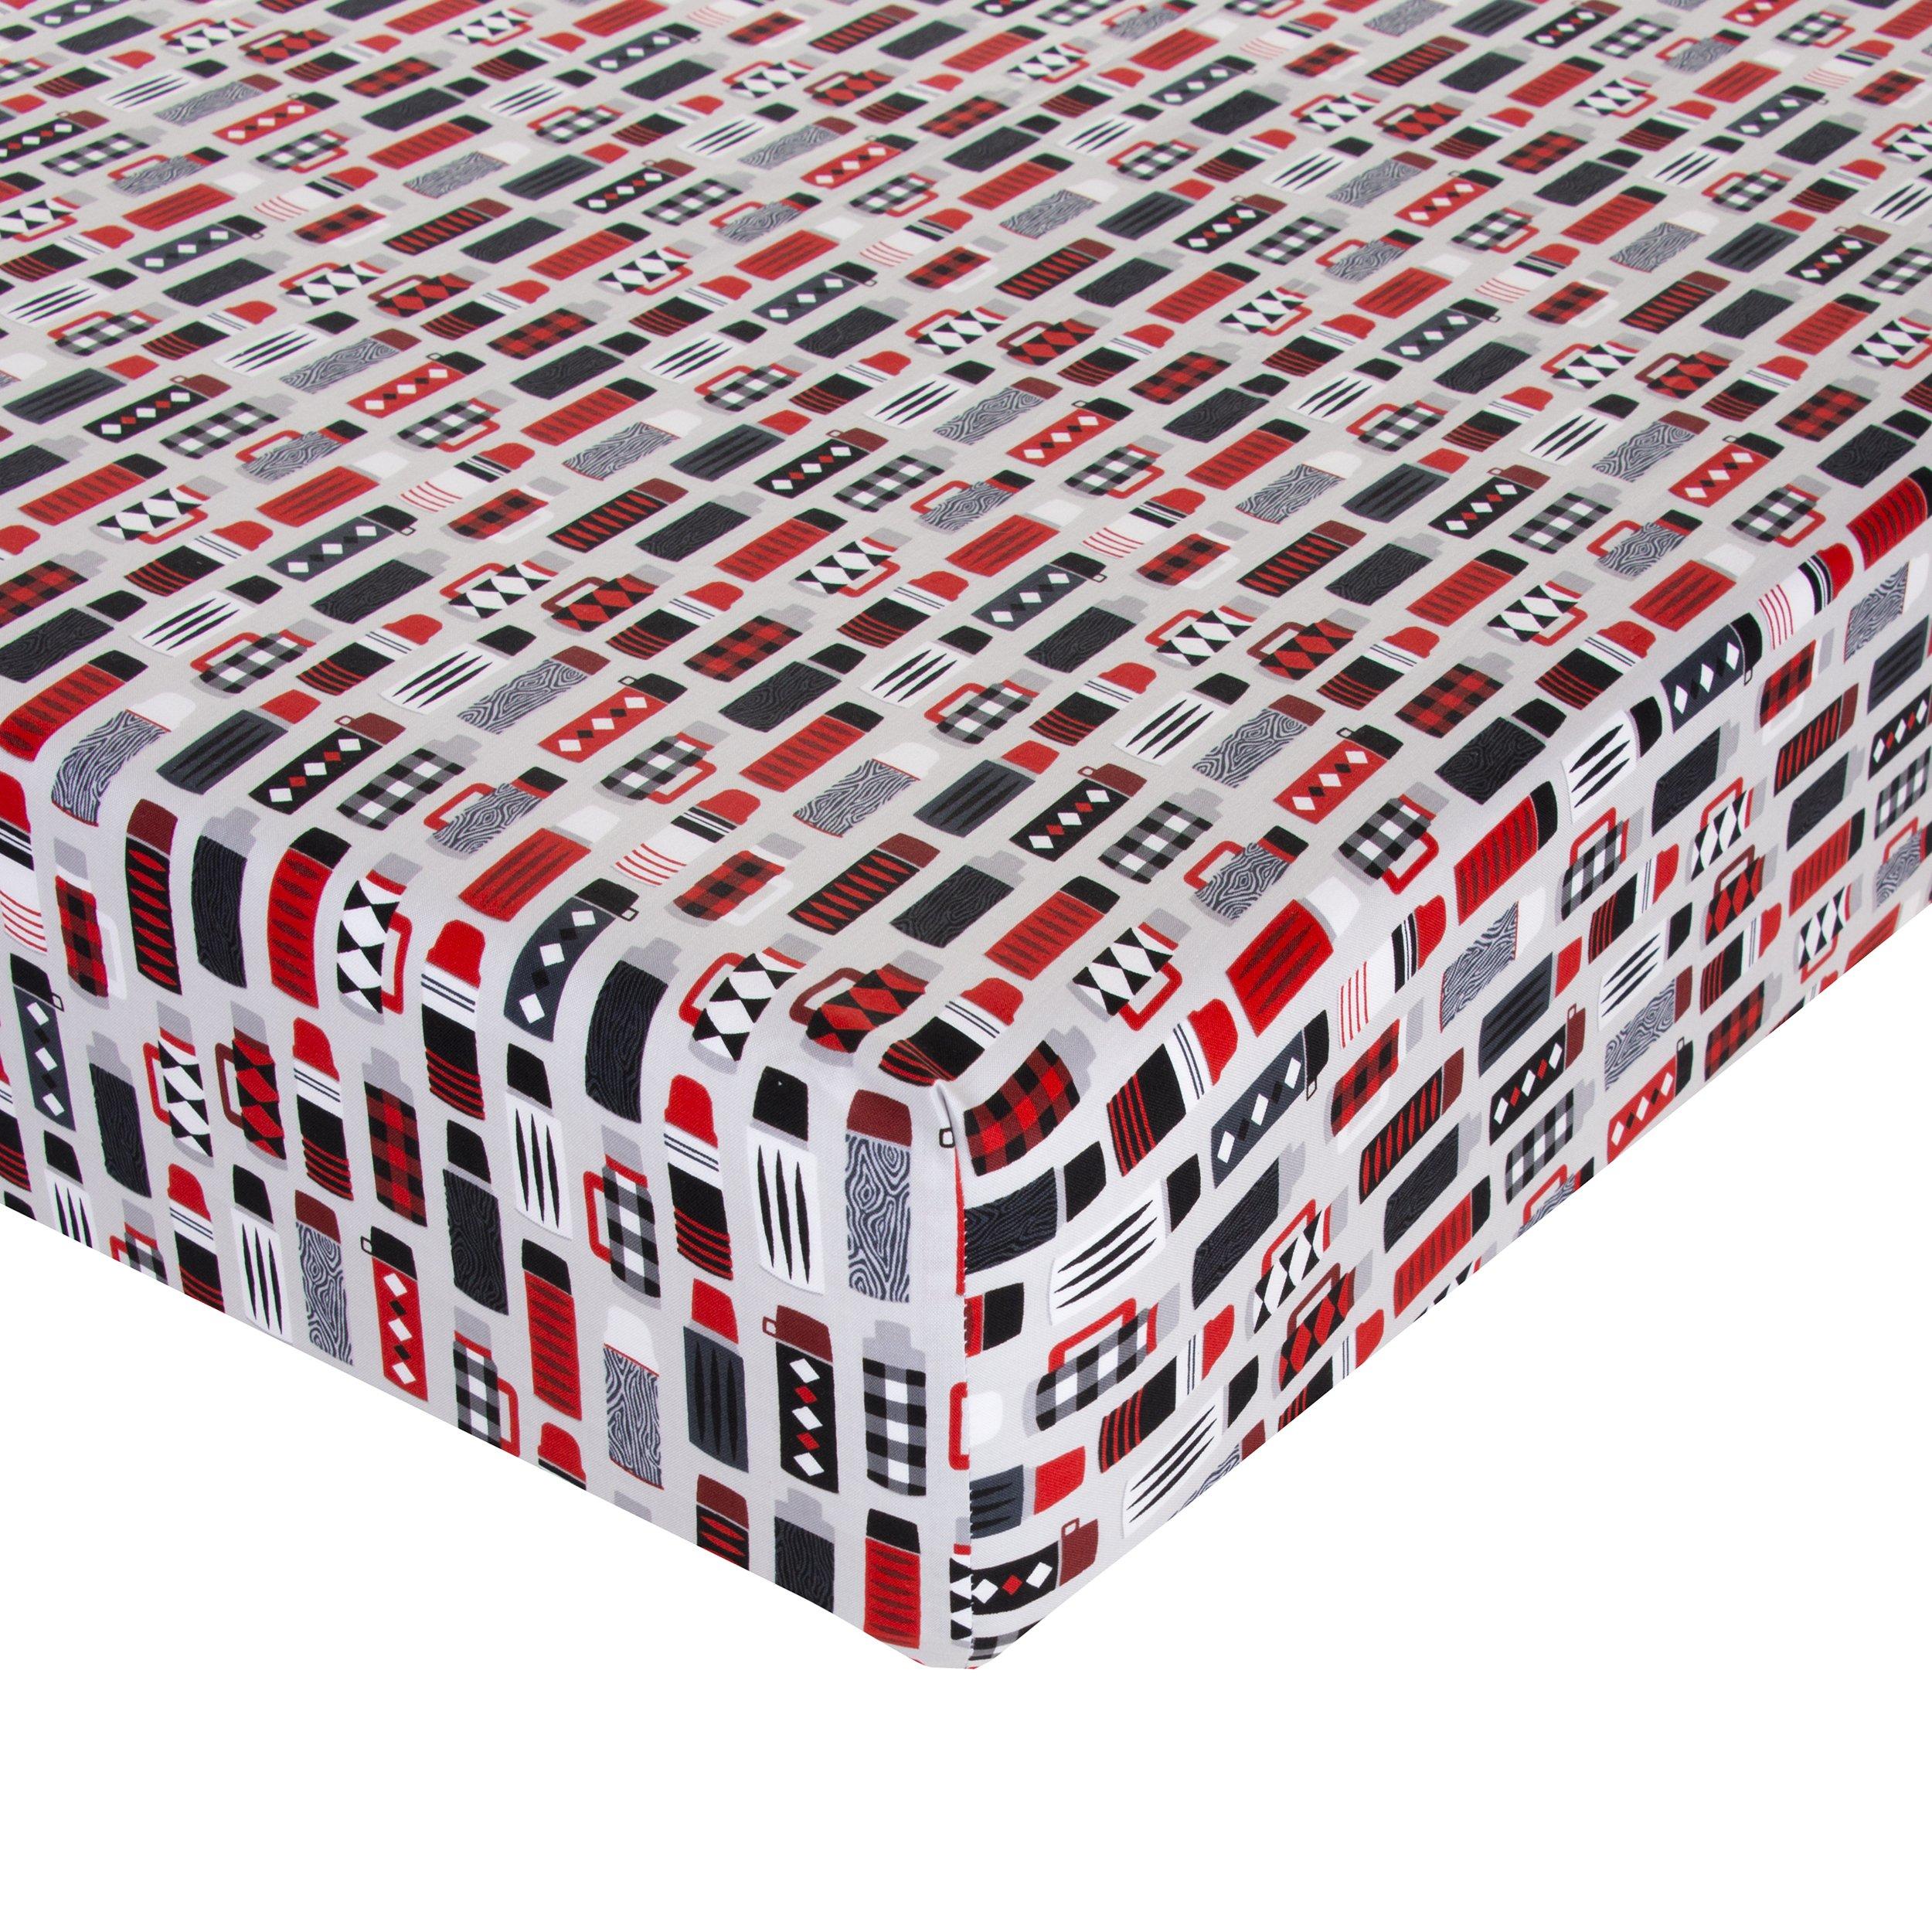 Glenna Jean Thermos Crib Sheet Fitted 28''x52''x8'' Nursery Standard